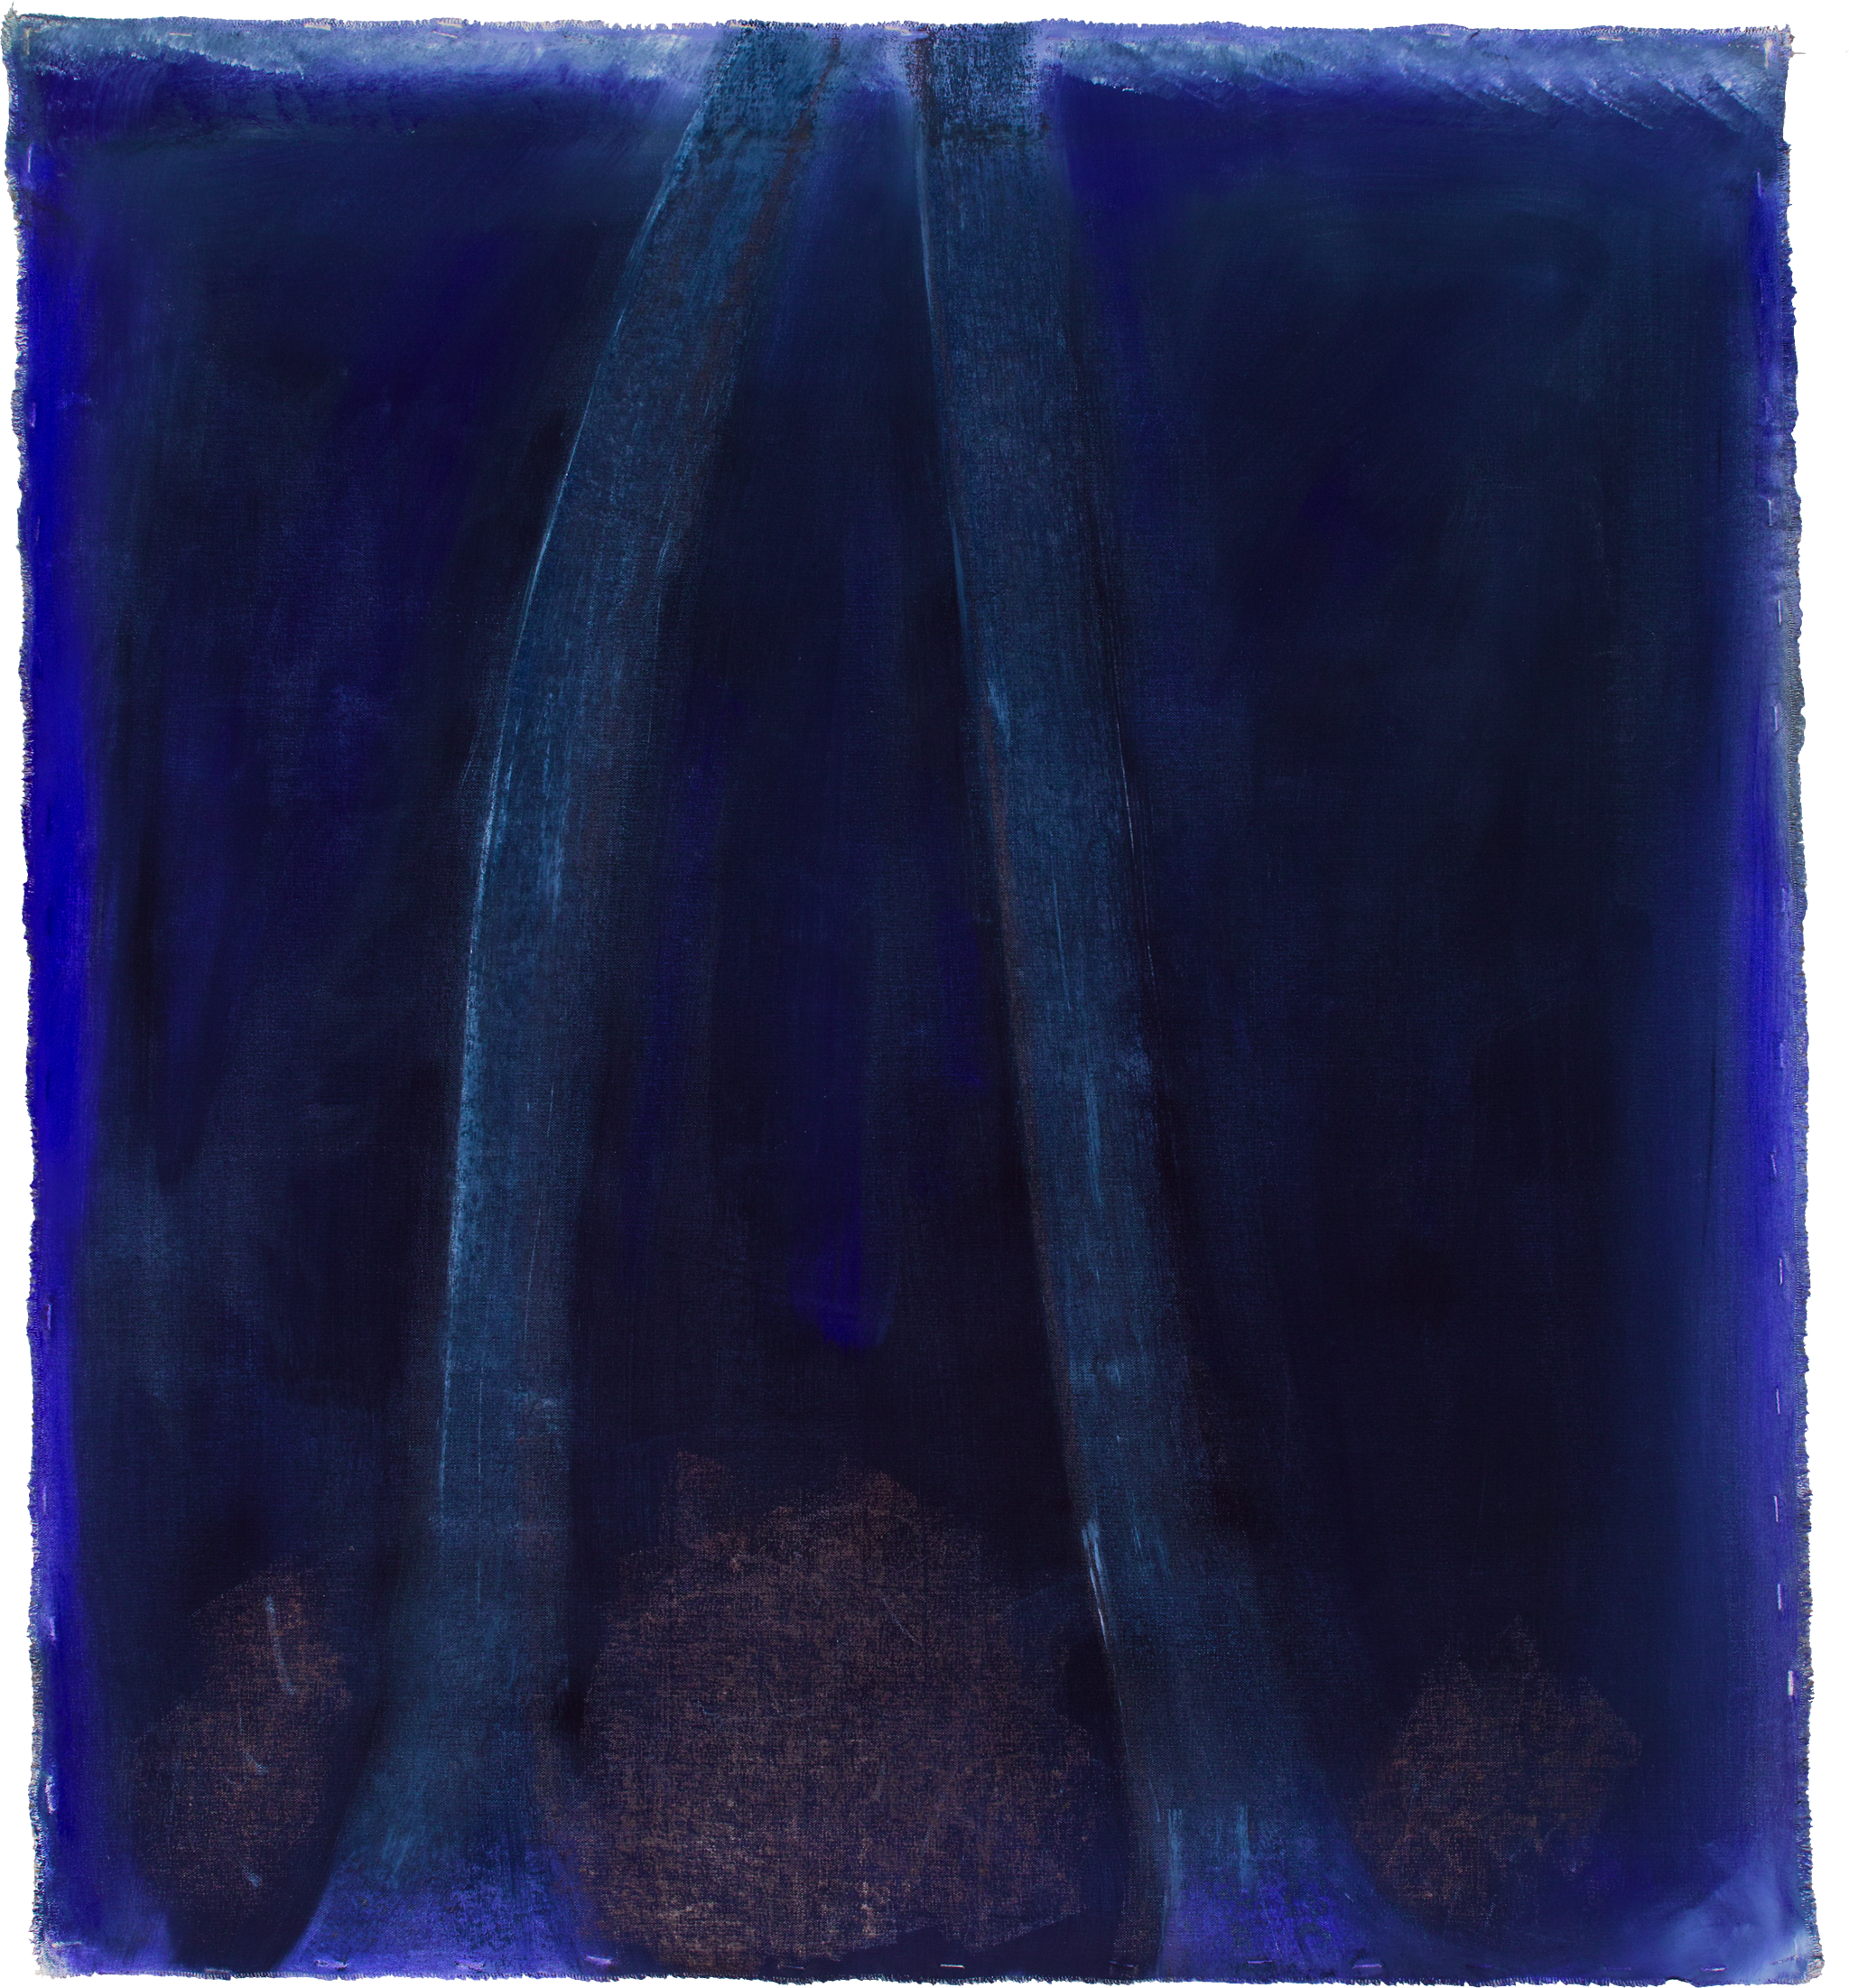 Phantom Forest Blue